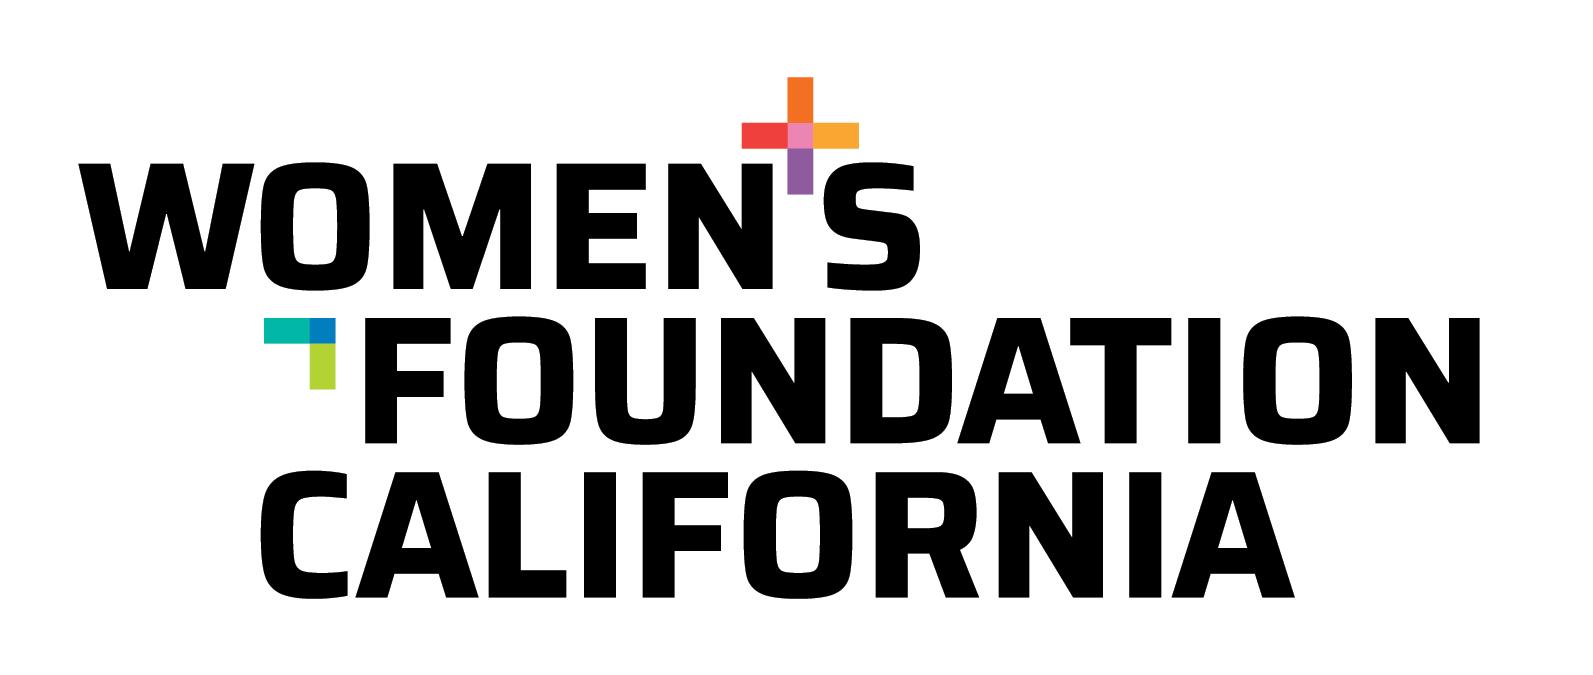 Women's Foundation of California logo